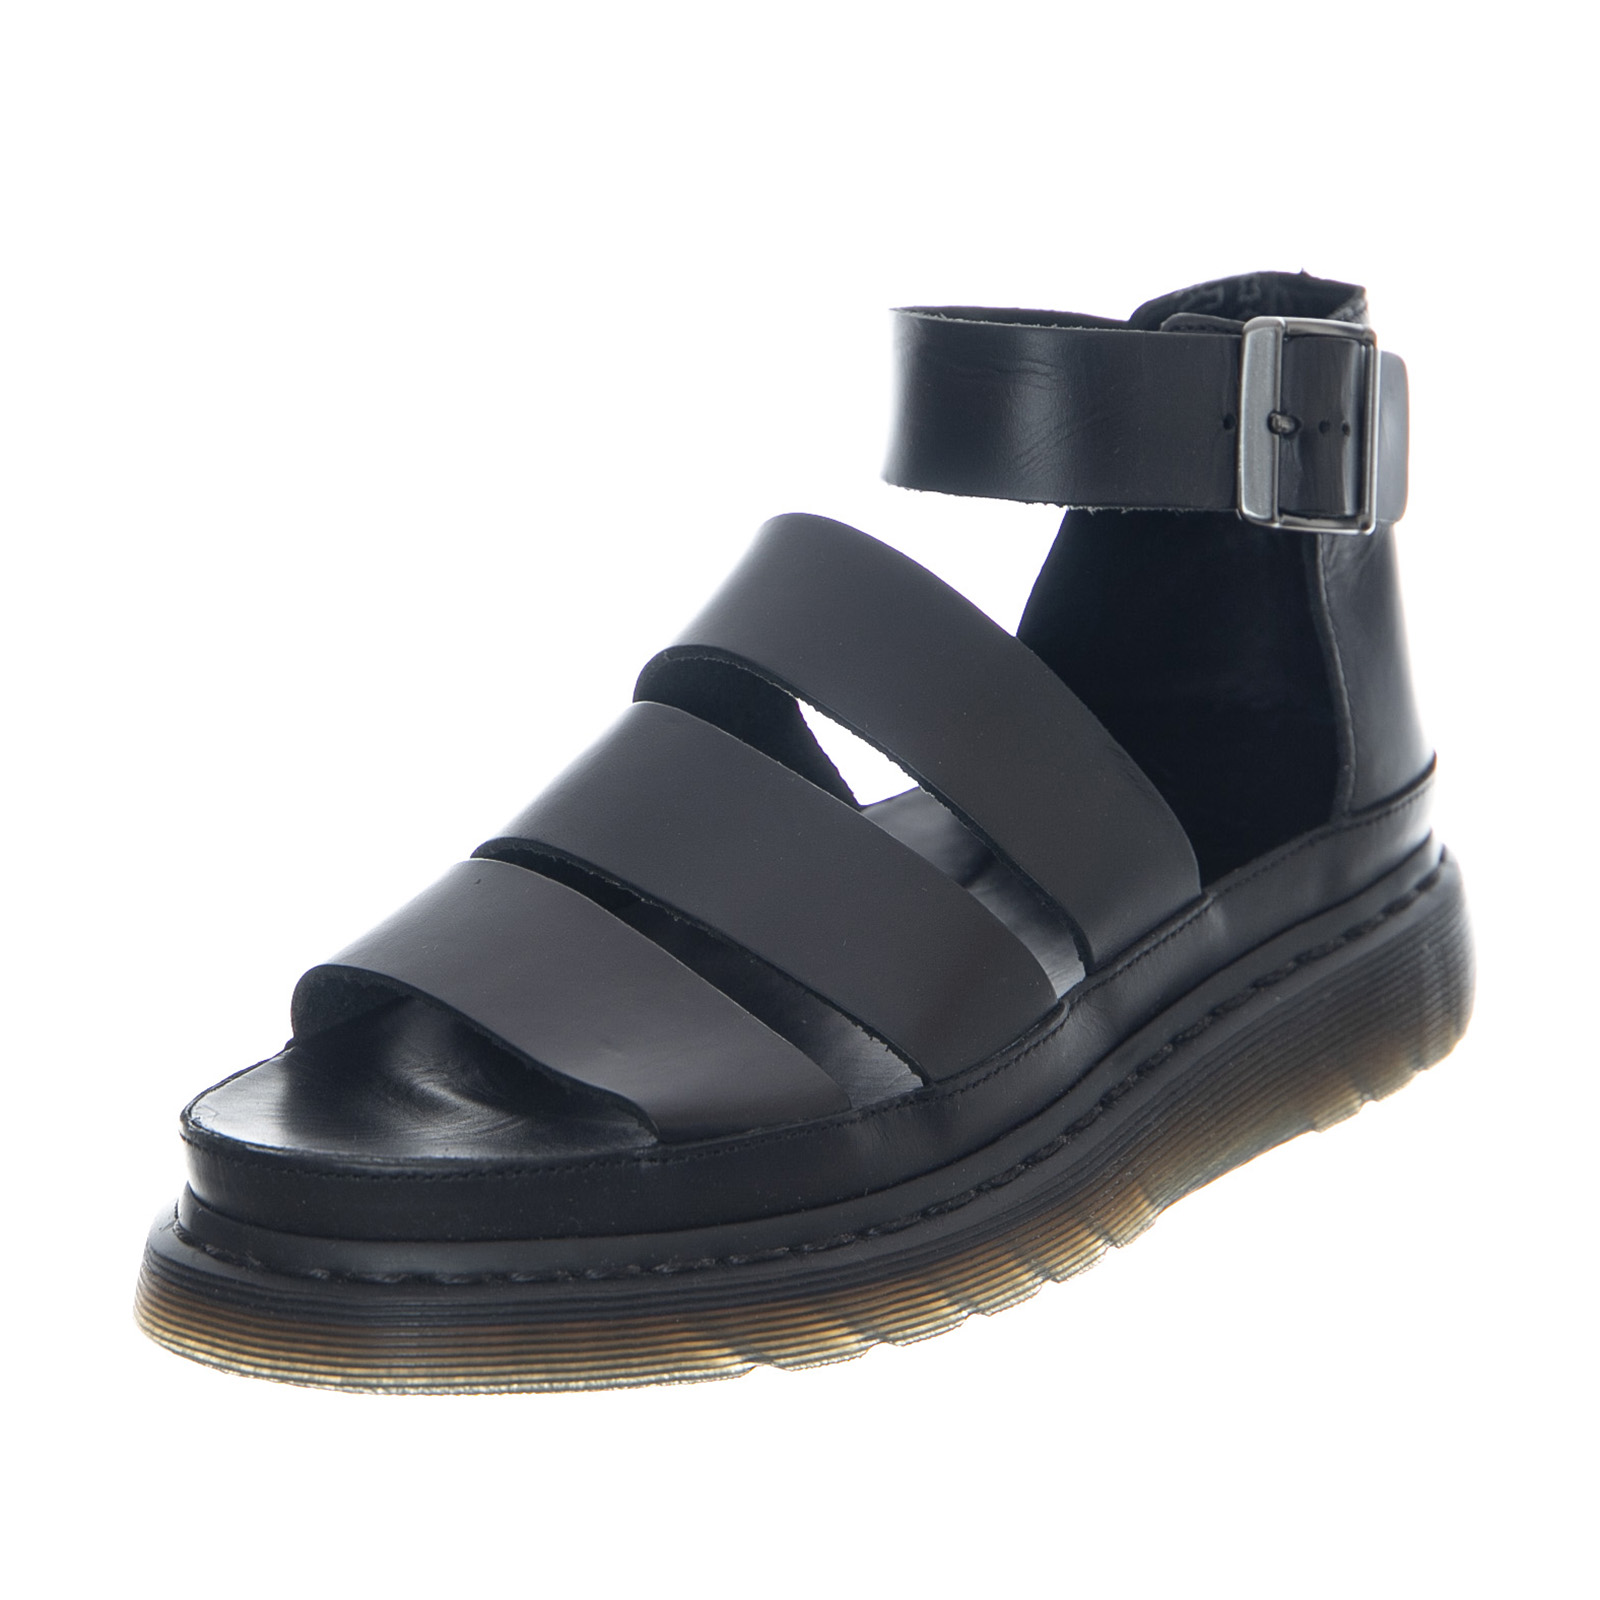 302b570463c1 Dr.Martens Clarissa Brando Black - Women s Sandals Black